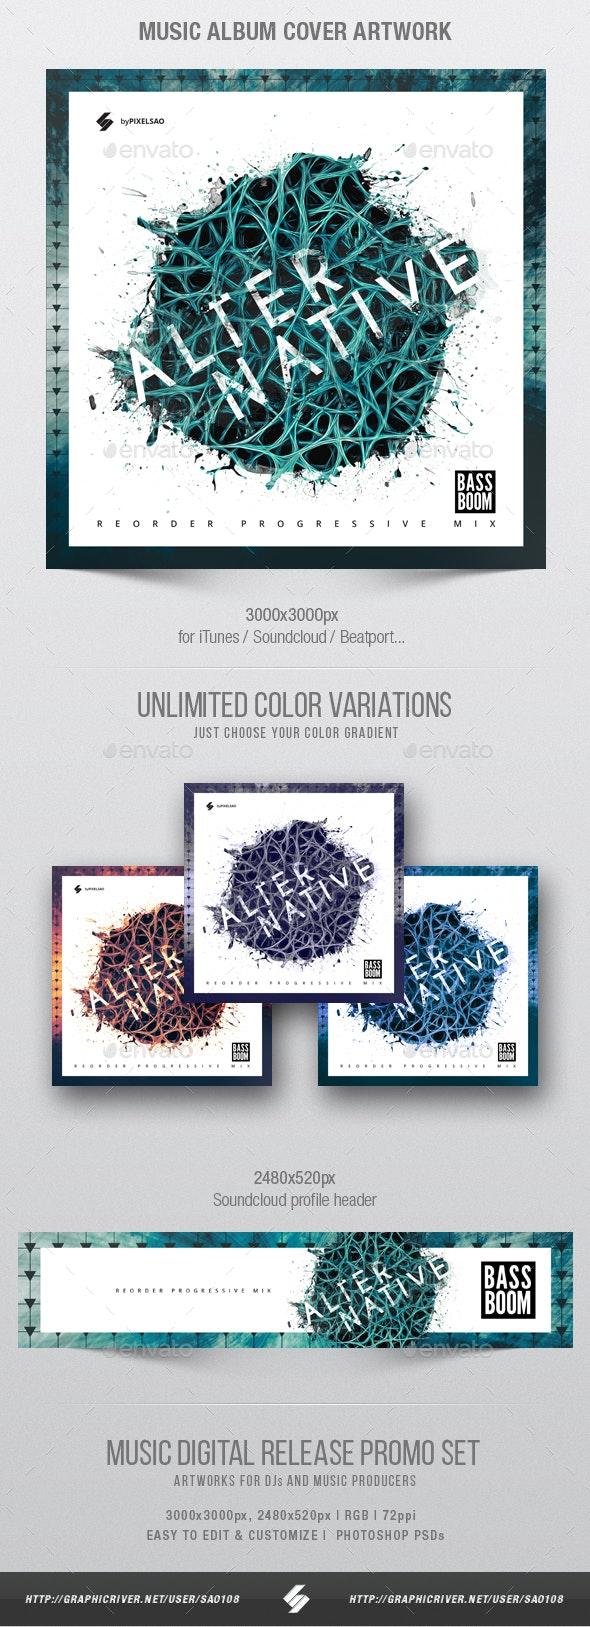 Alternative - Music Album Cover Artwork Template - Miscellaneous Social Media